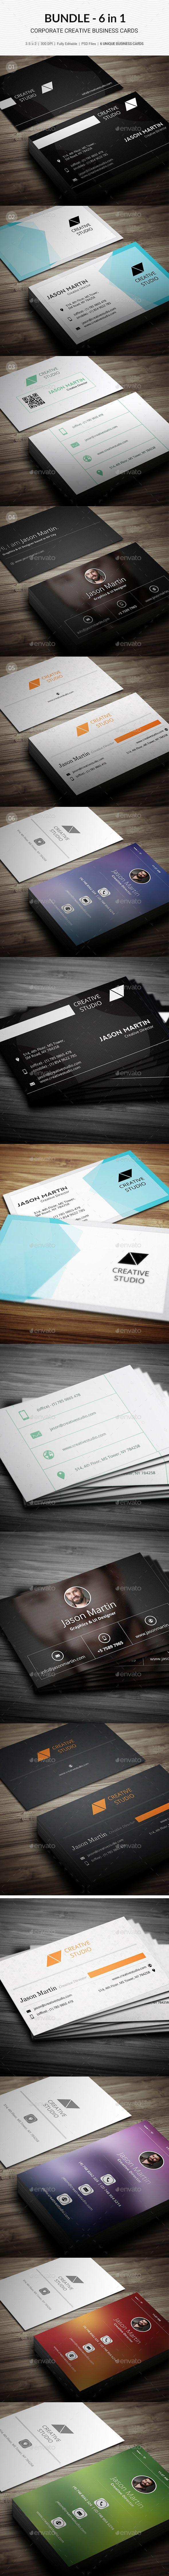 6 Creative Business Card Templates PSD